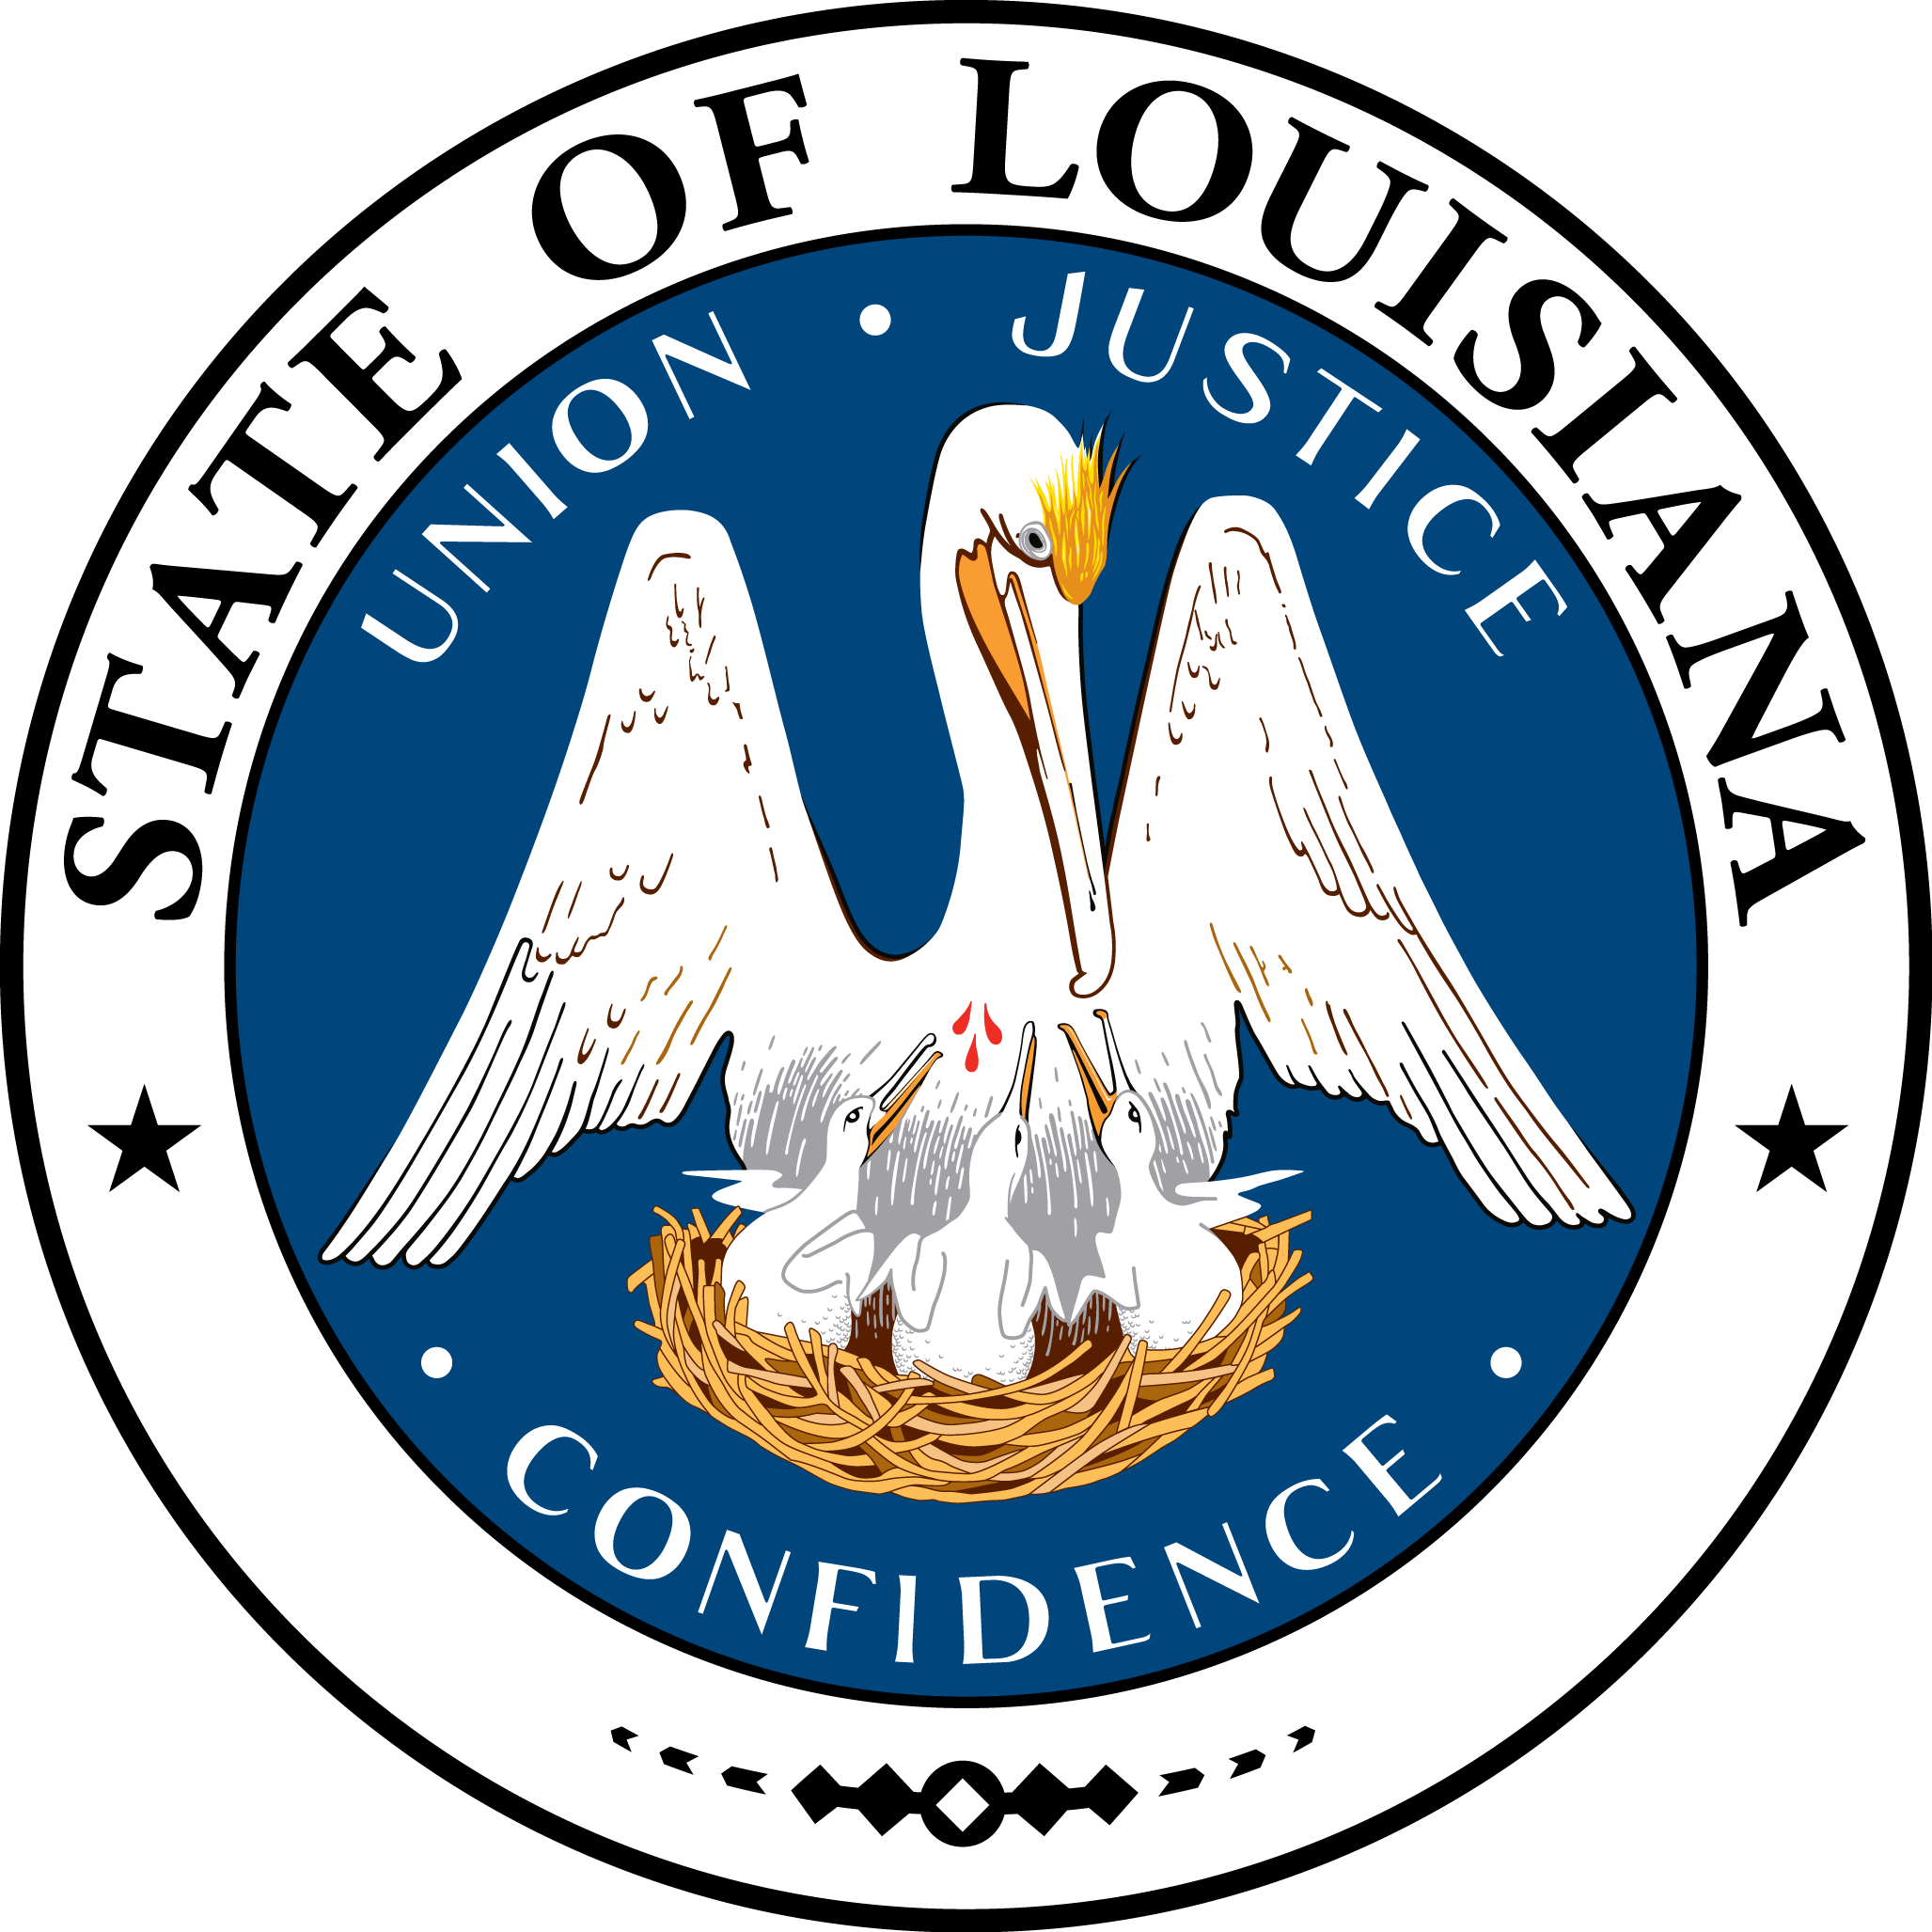 Blair Constant Assistant District Attorney 504-361-2626